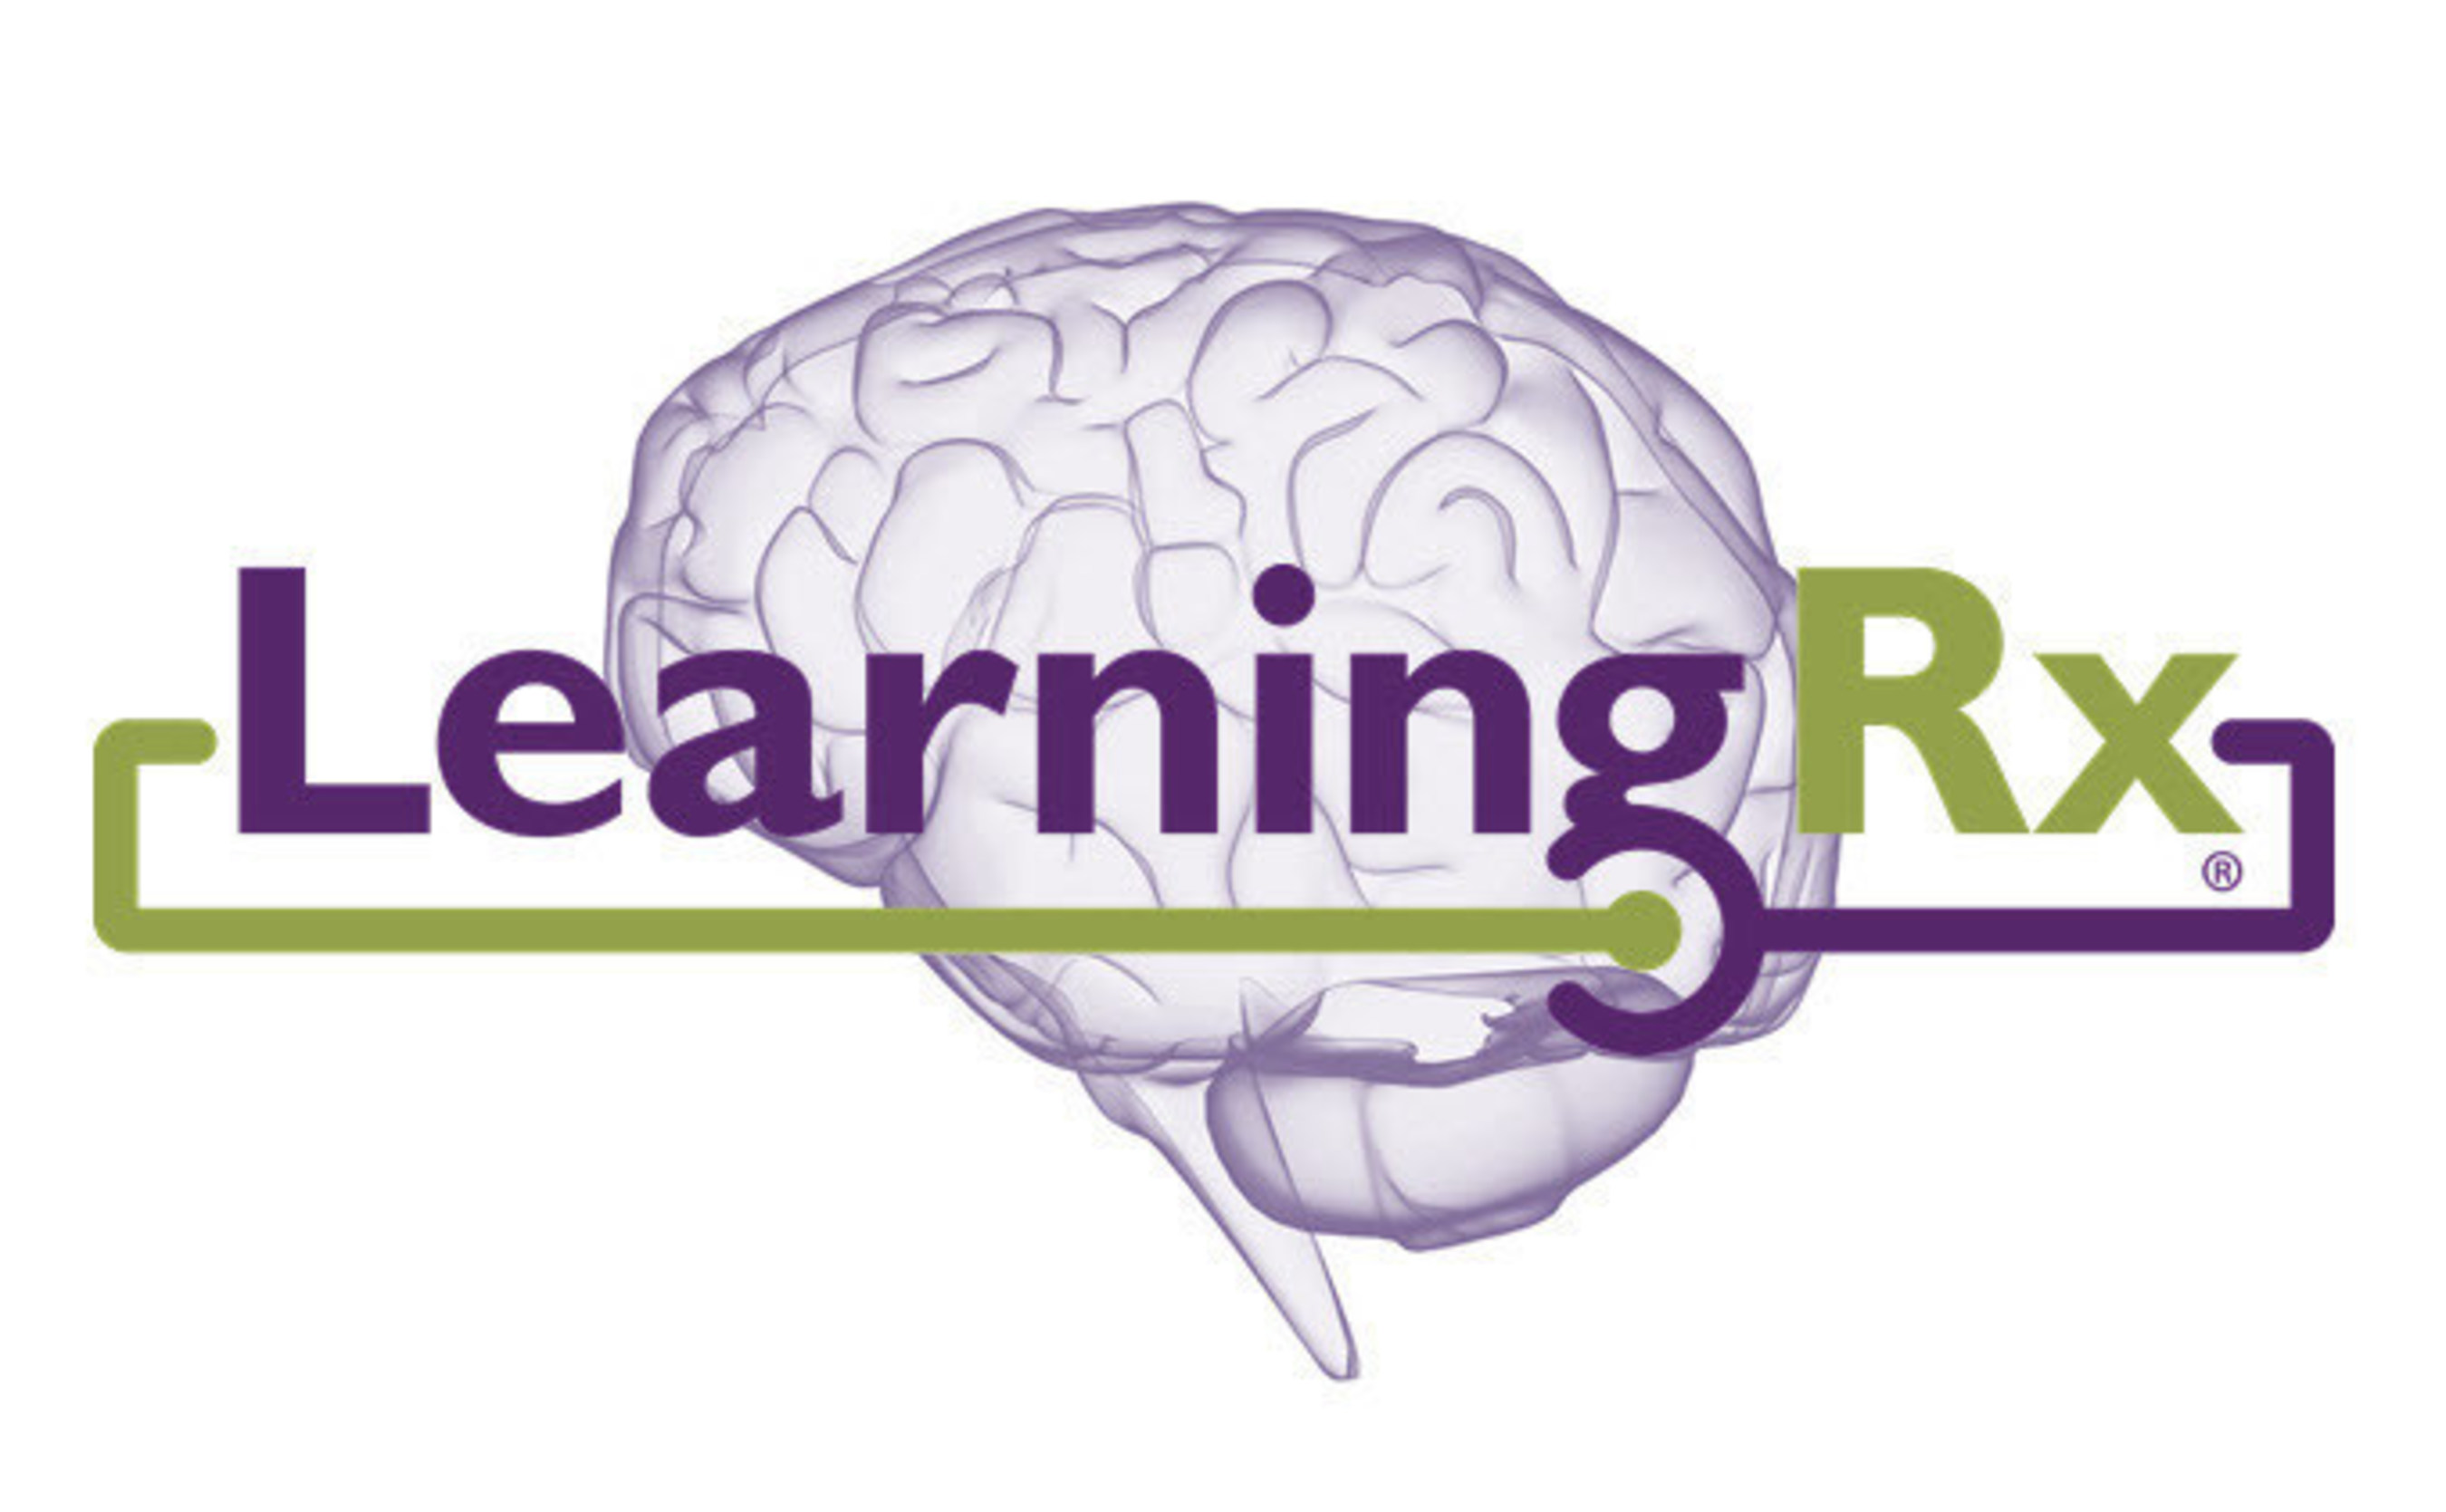 LearningRx - Brain Training - Study Showed Personal Brain Training Results Surpassed Digital Brain Training